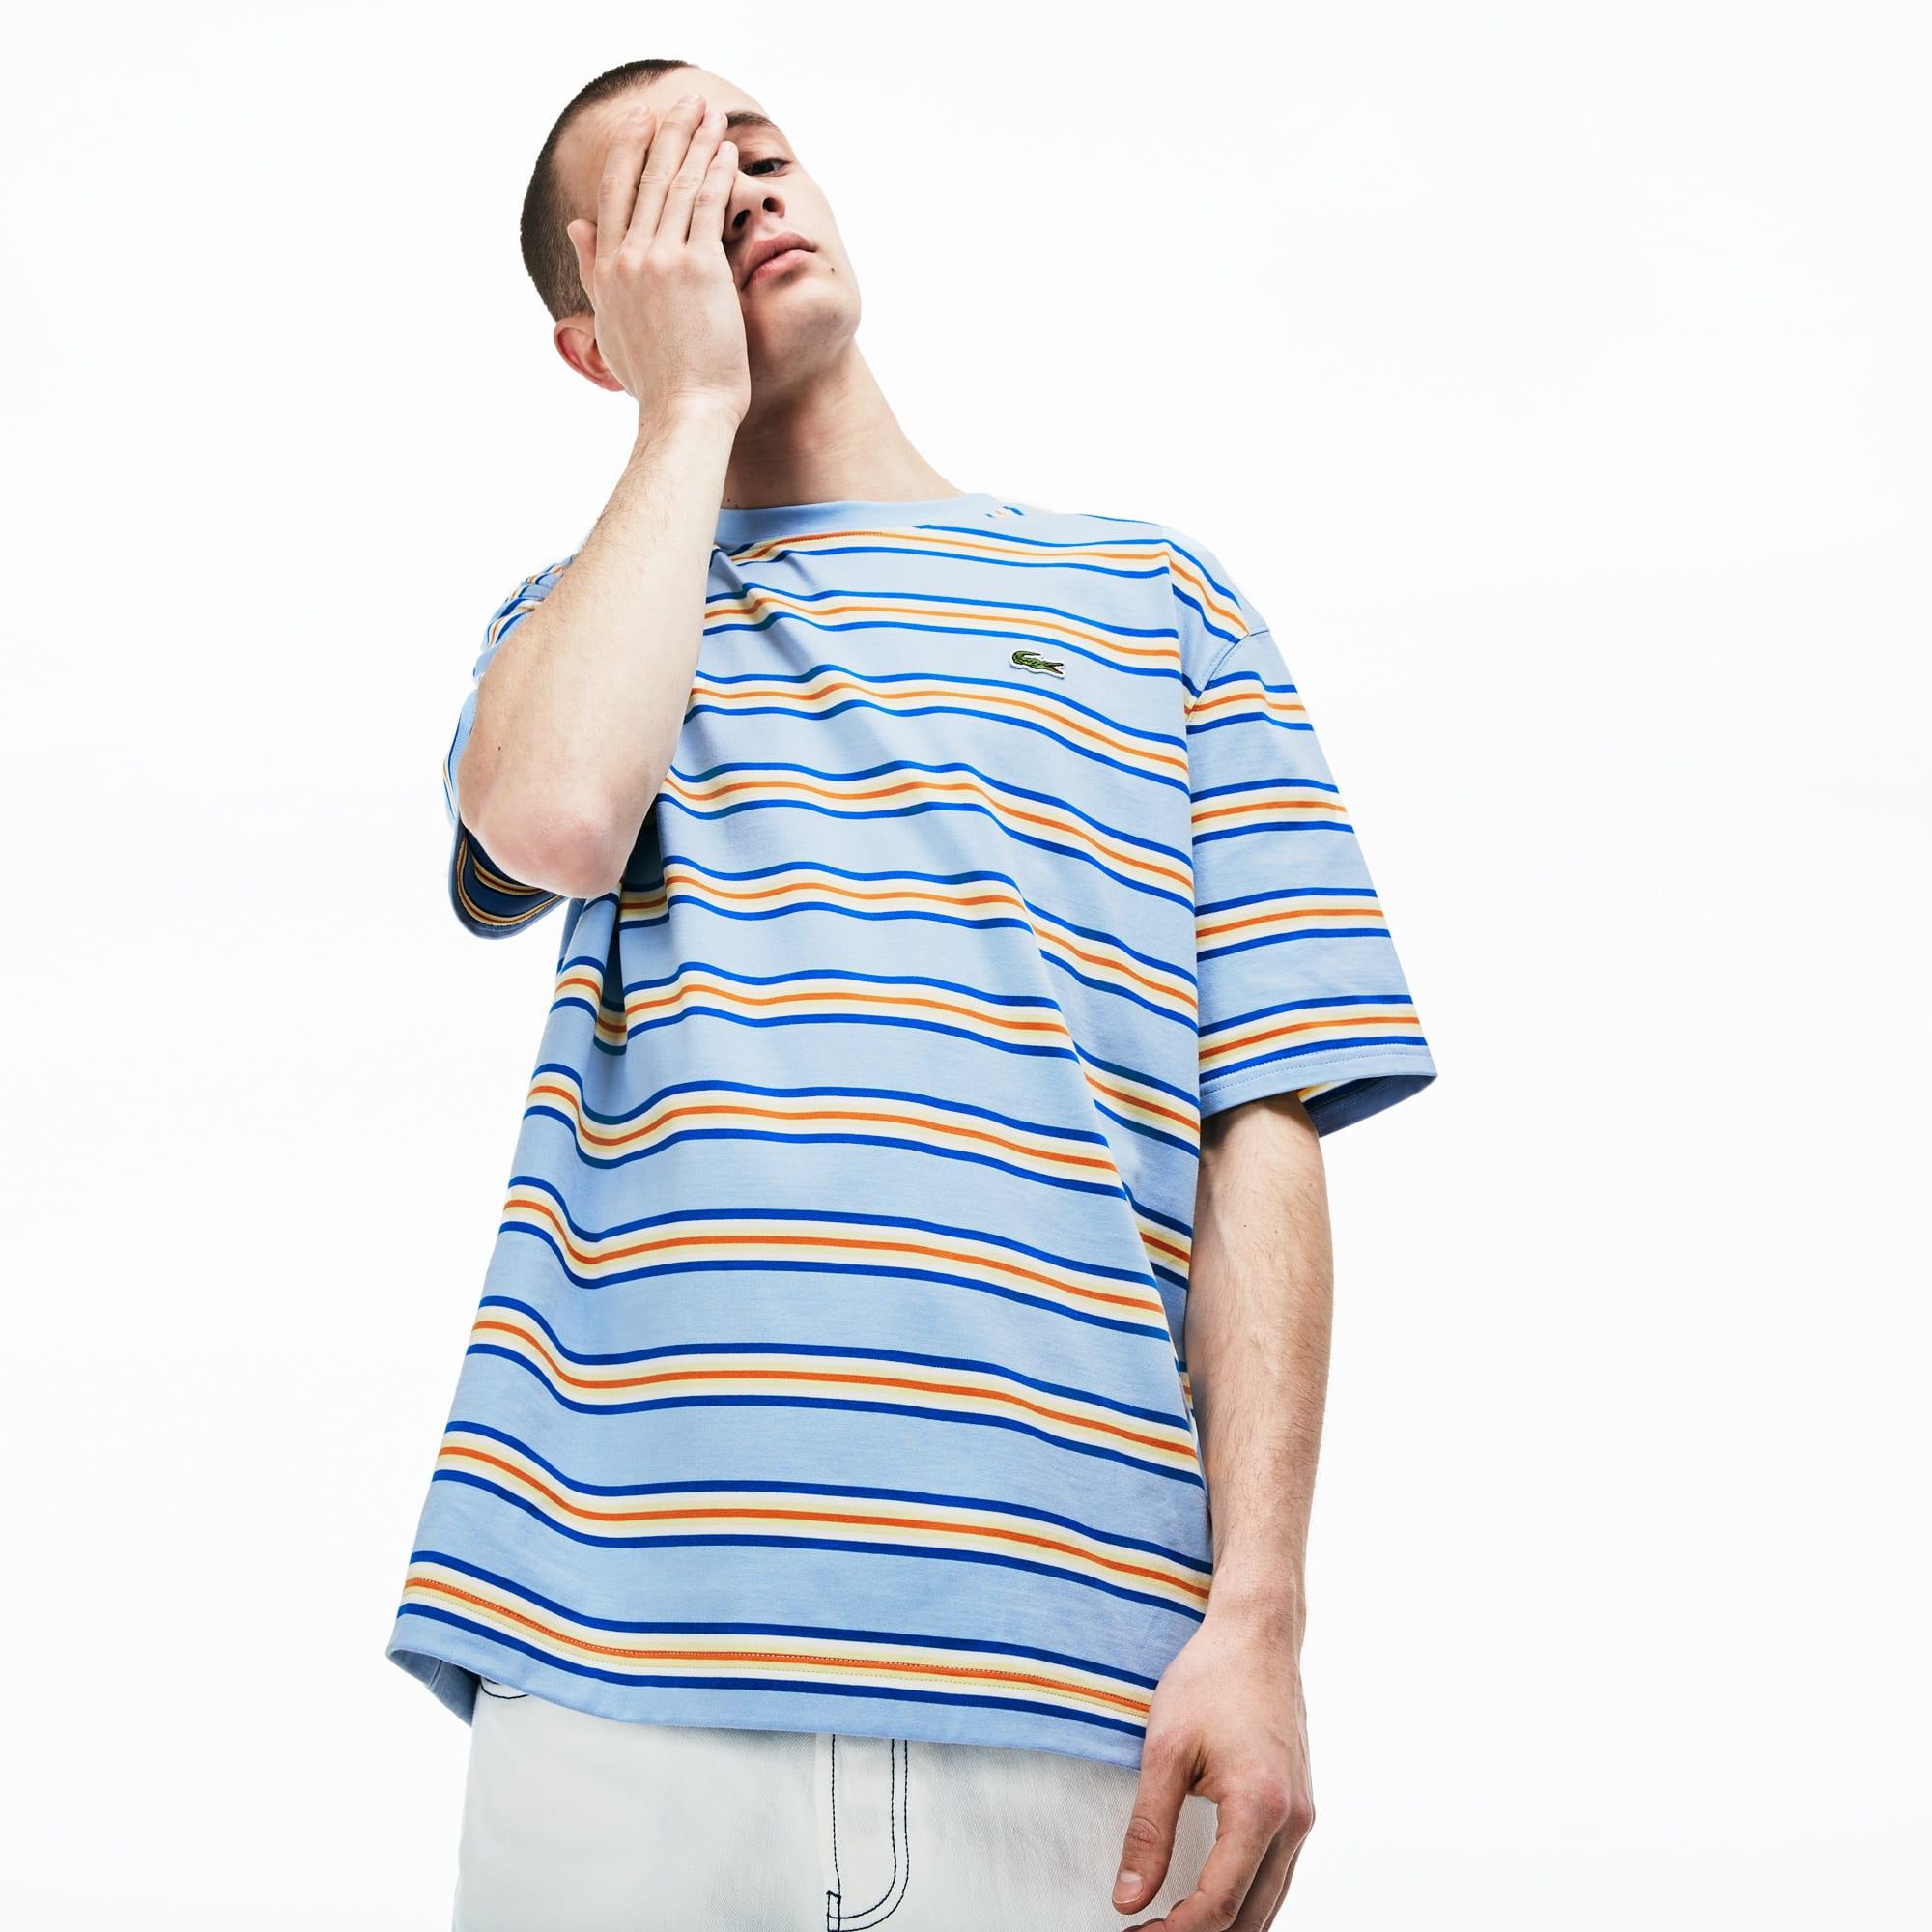 d5afe36672fc7 T-Shirts